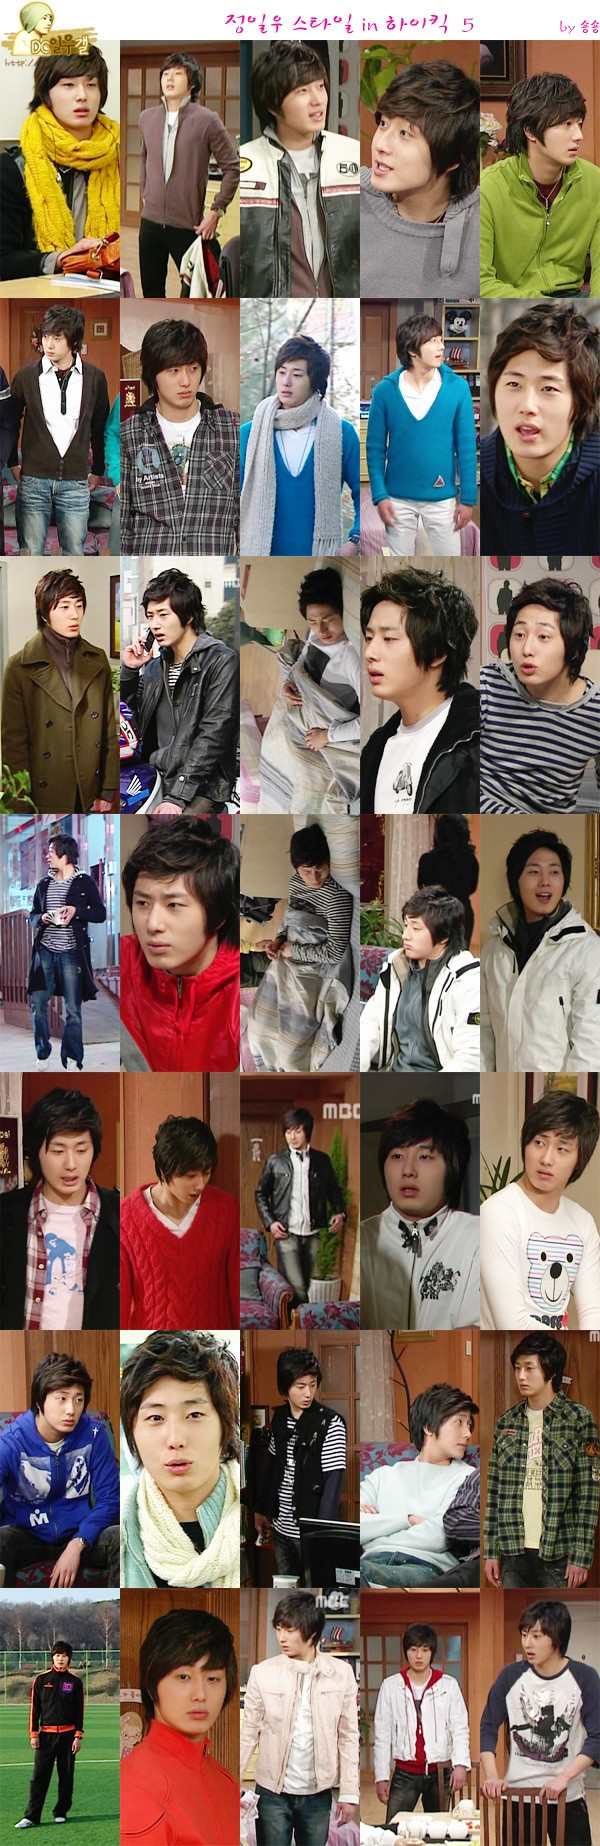 2007 JIW Collage 6